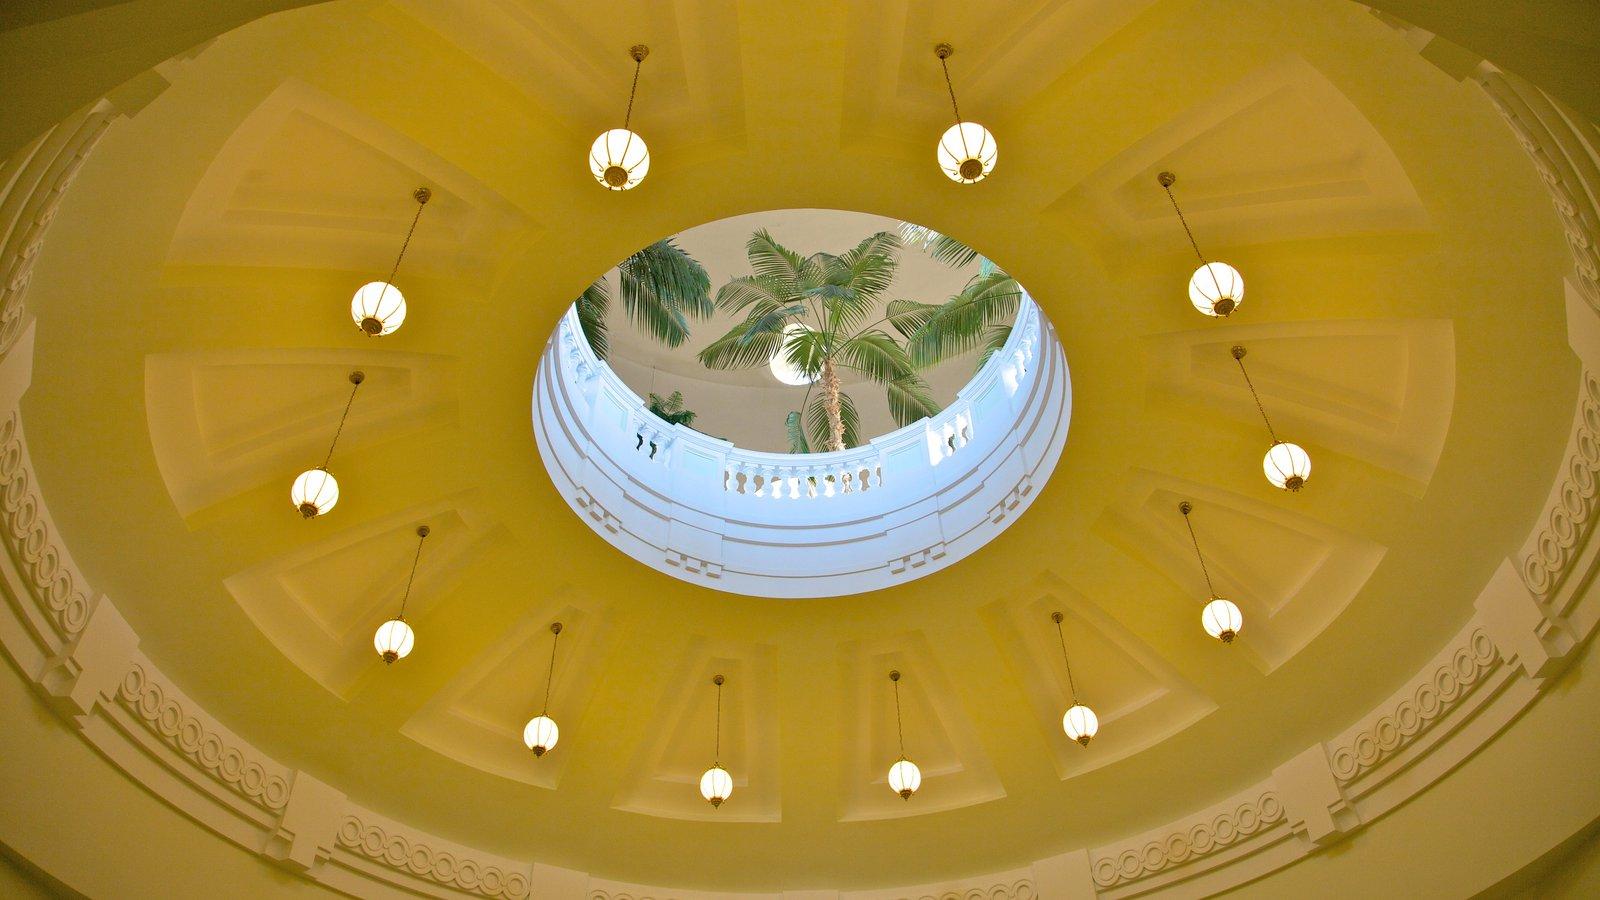 Alberta Legislature Building showing interior views